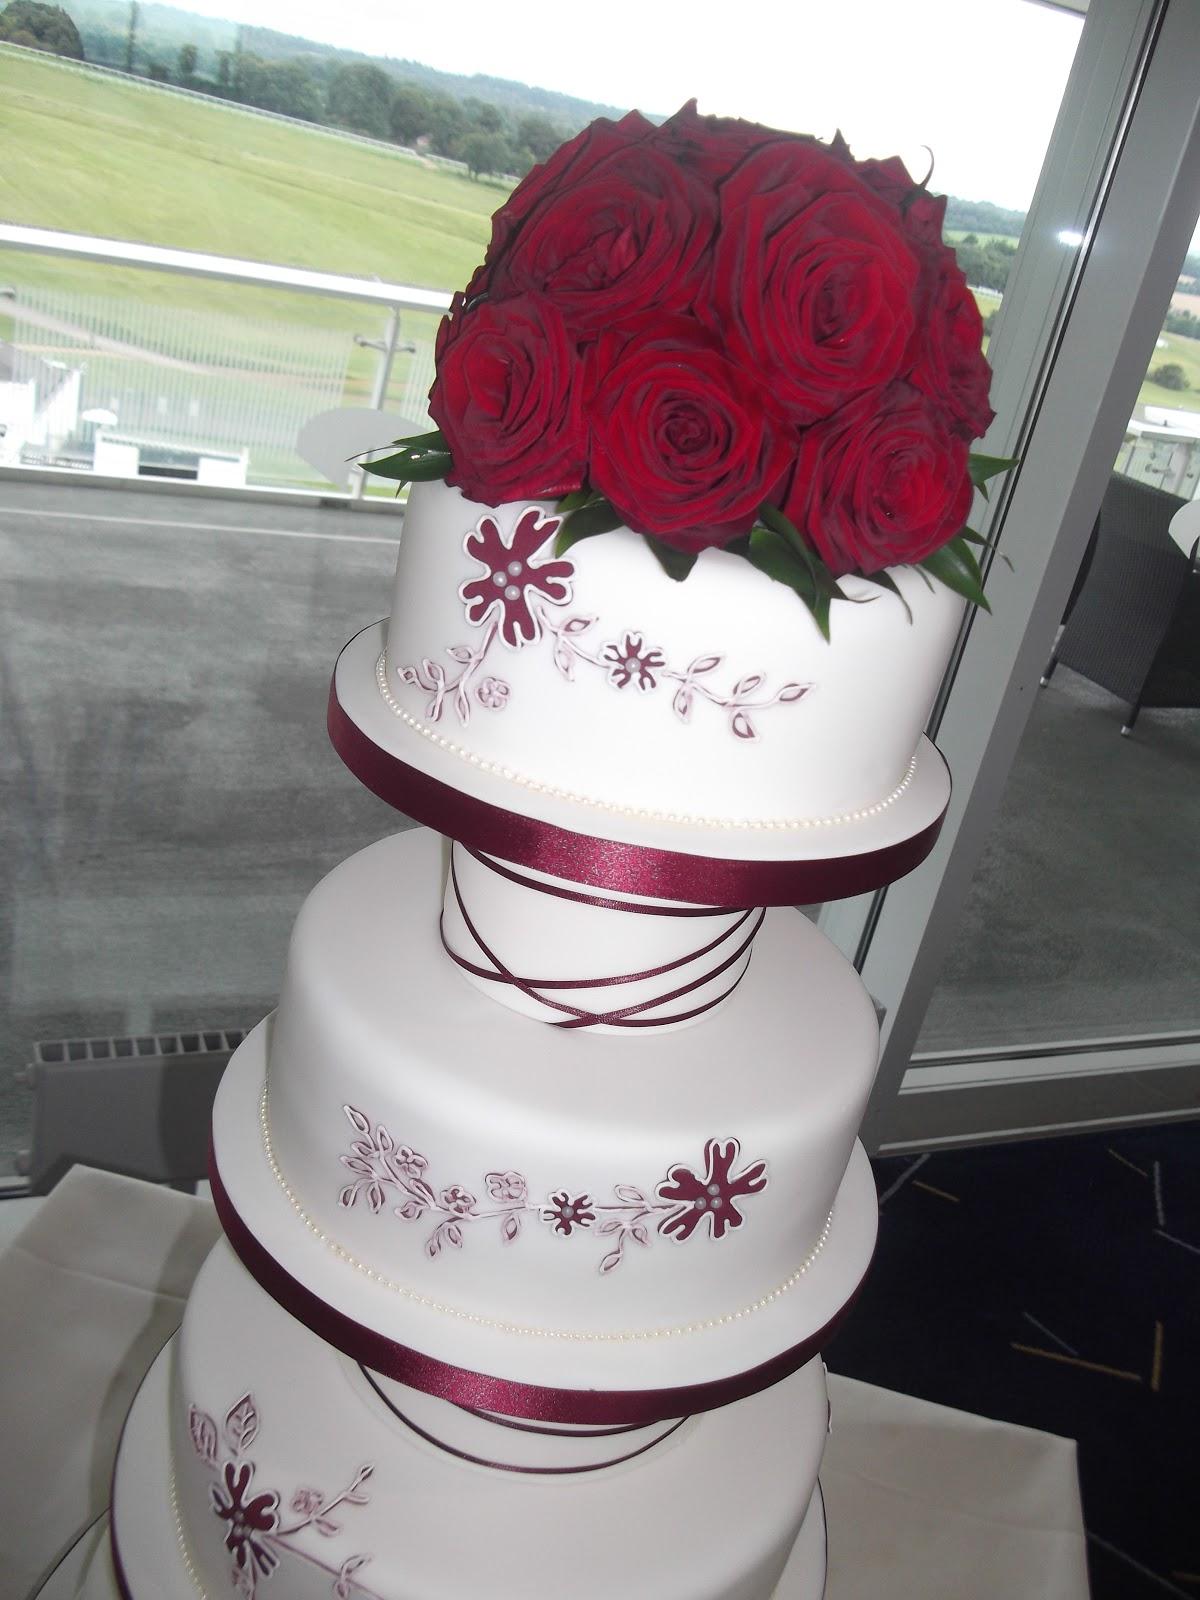 Wedding Cake Art Karen Hill : Cakes By Karen: 4 Tier Wedding Cake